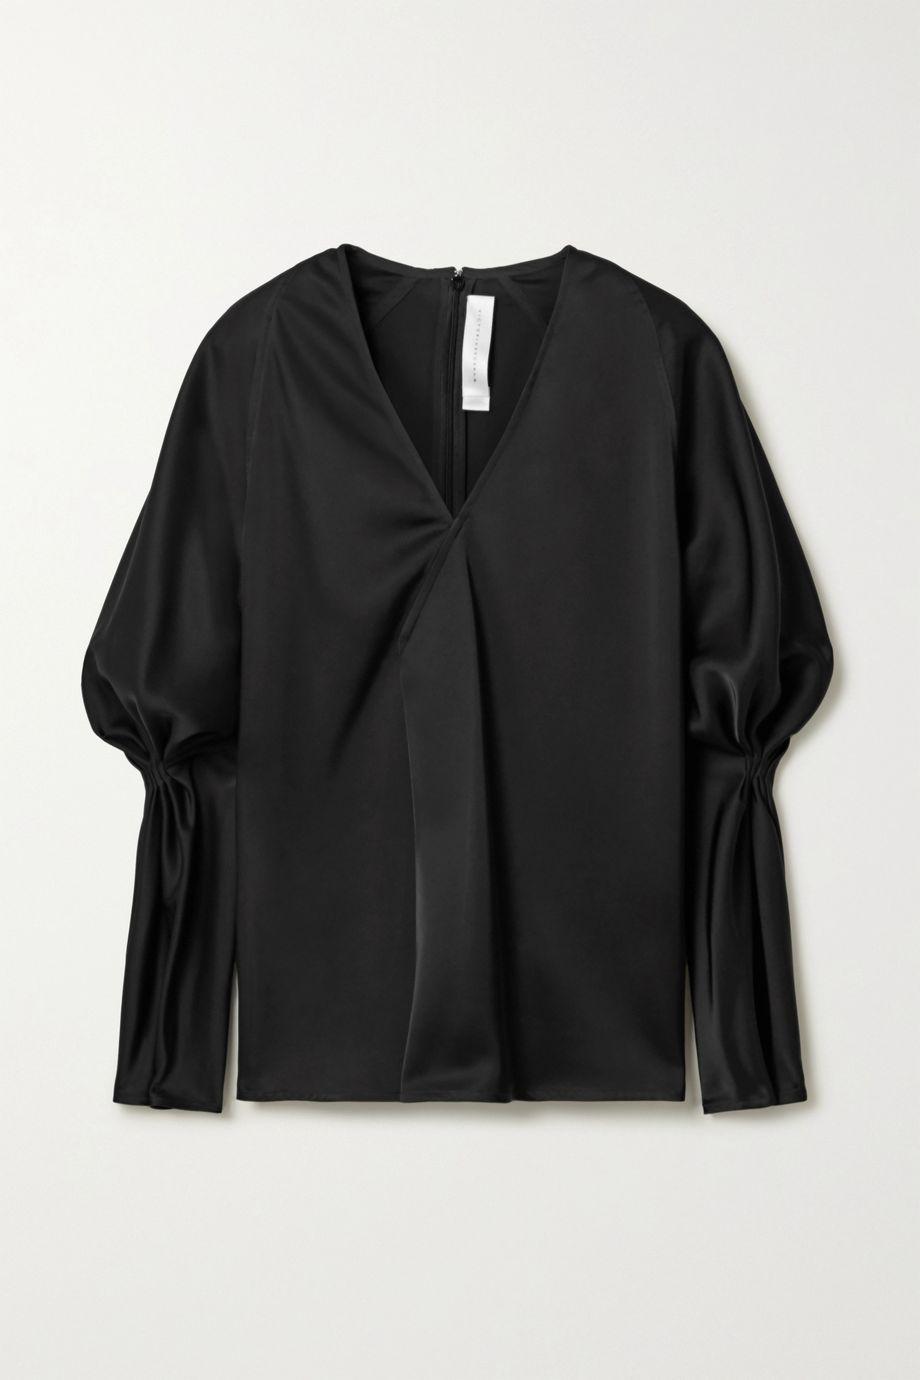 Victoria Beckham Wrap-effect gathered satin blouse